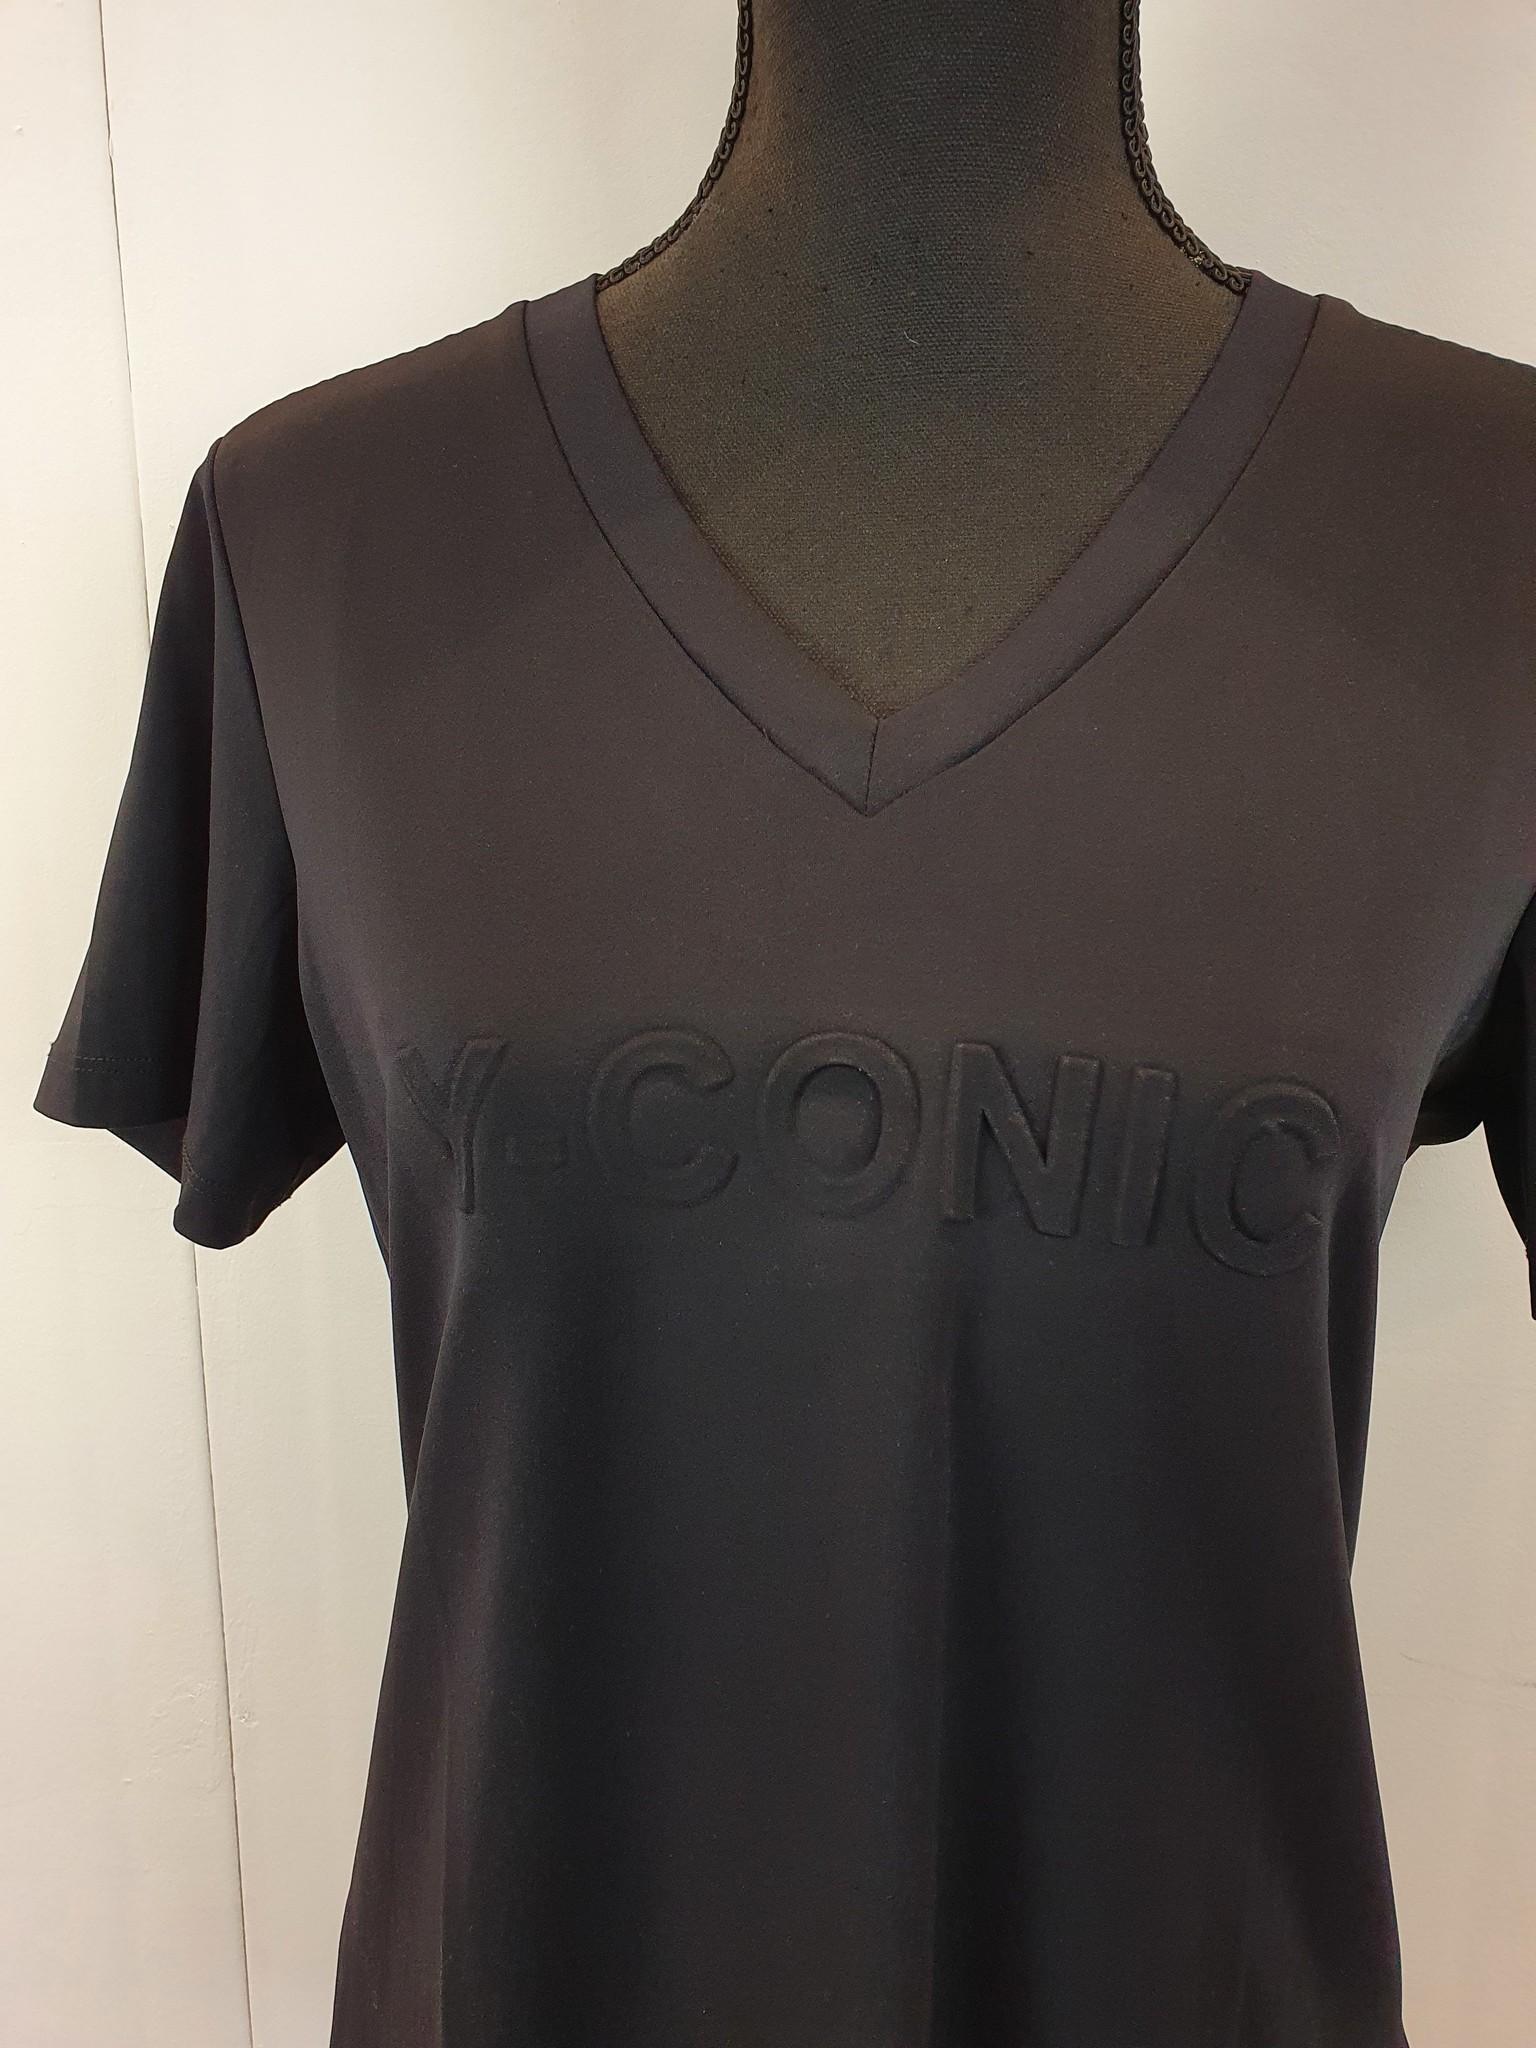 Y-Conic t-shirt Shantionea